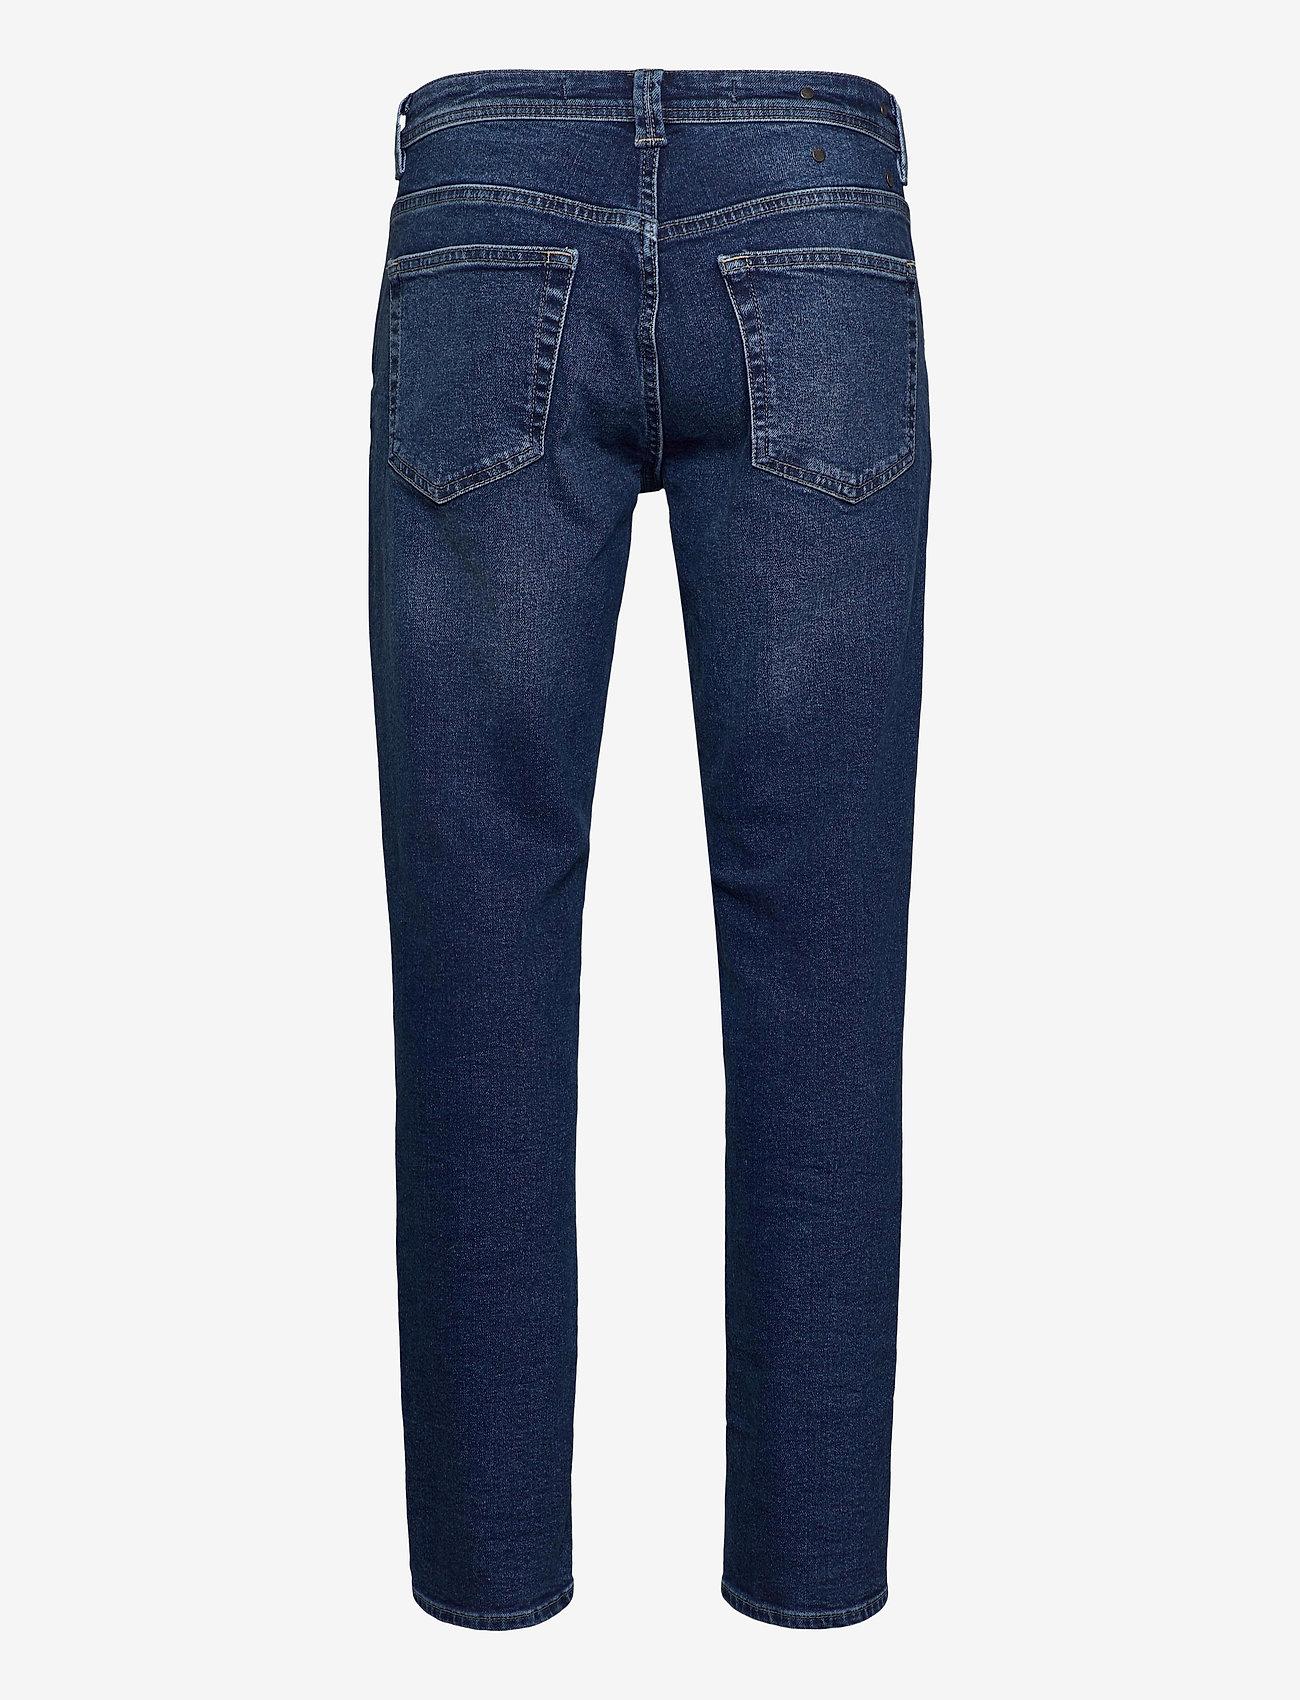 Gabba - Nico K3572 Jeans - regular jeans - rs1380 - 1